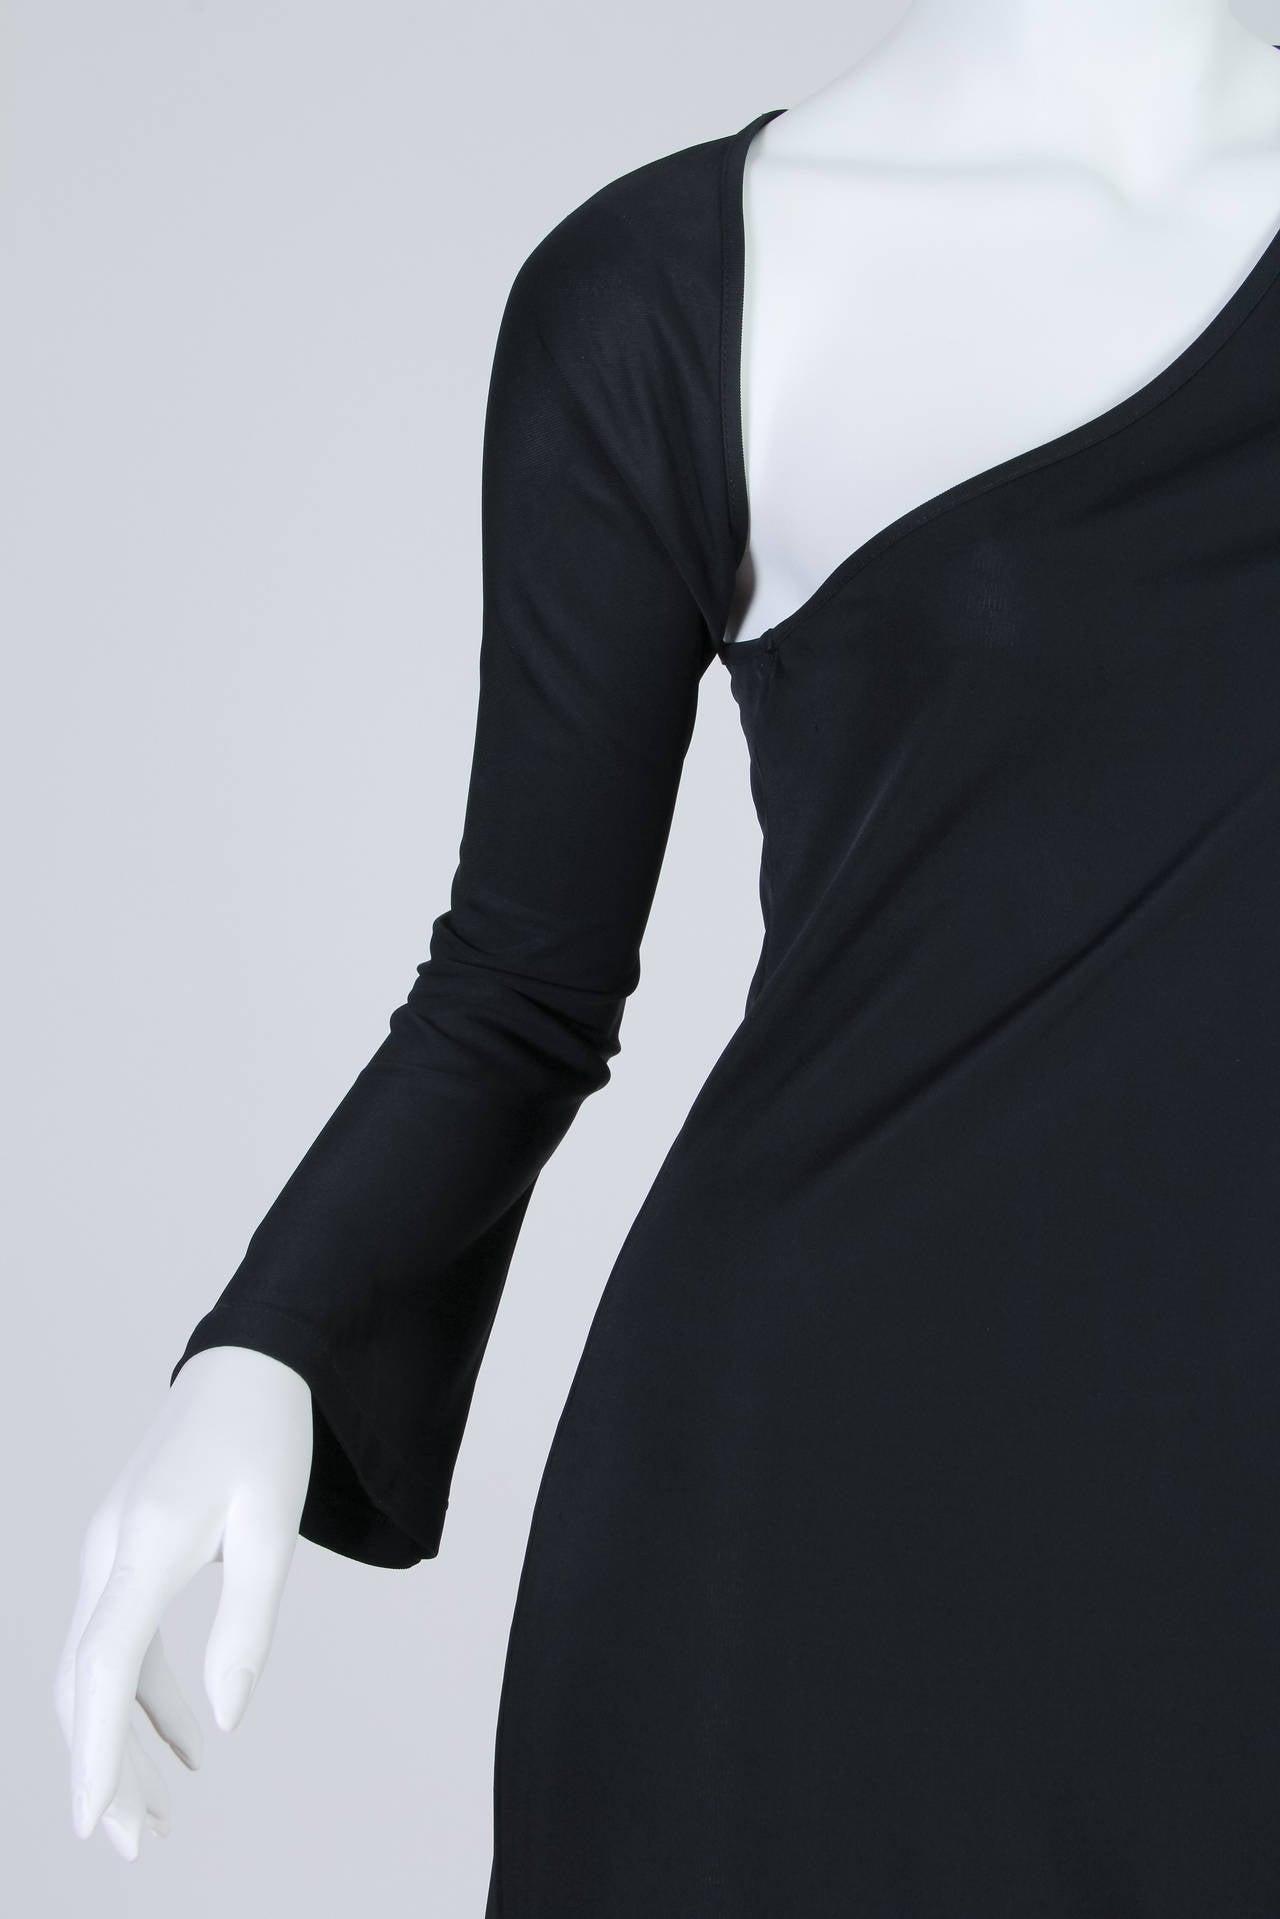 Jean Paul Gaultier Wraparound Sleeve Dress For Sale 5